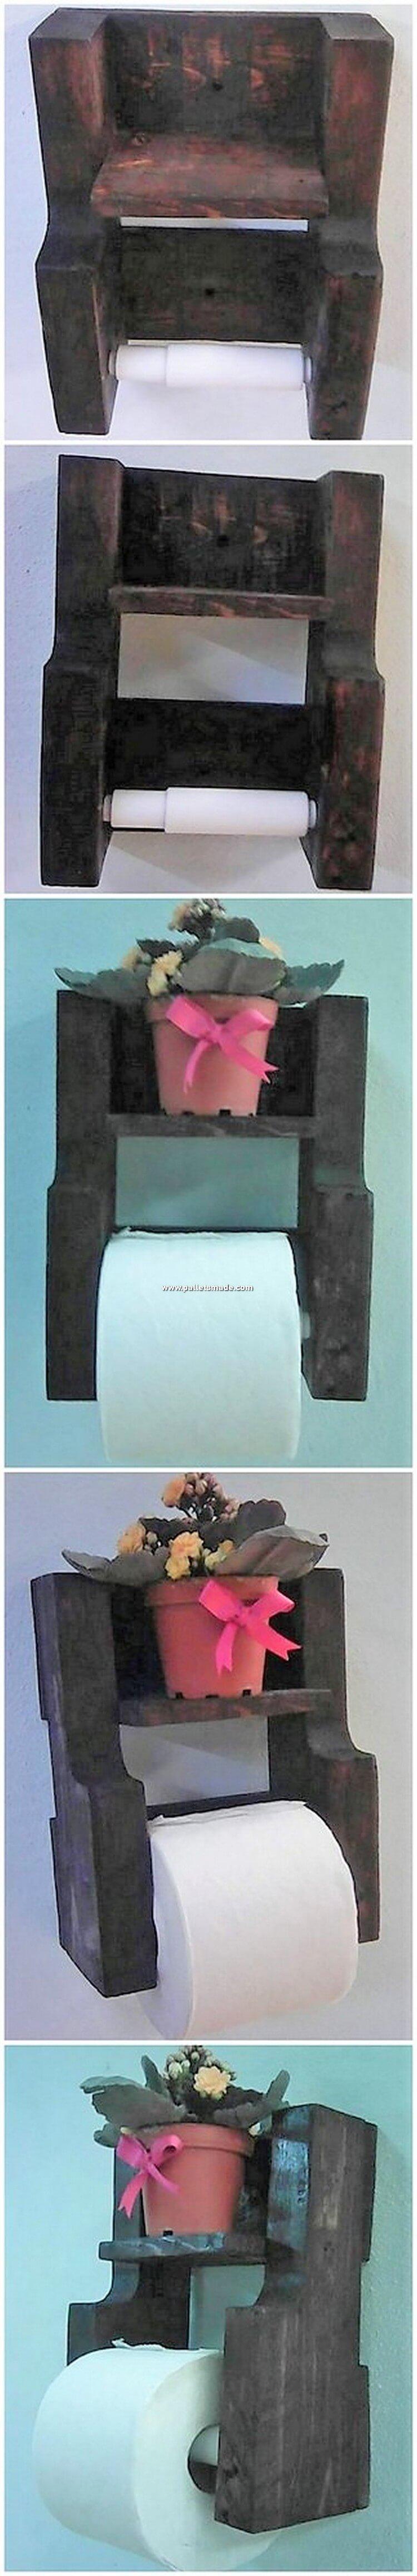 Pallet Toilet Paper Roll Holder